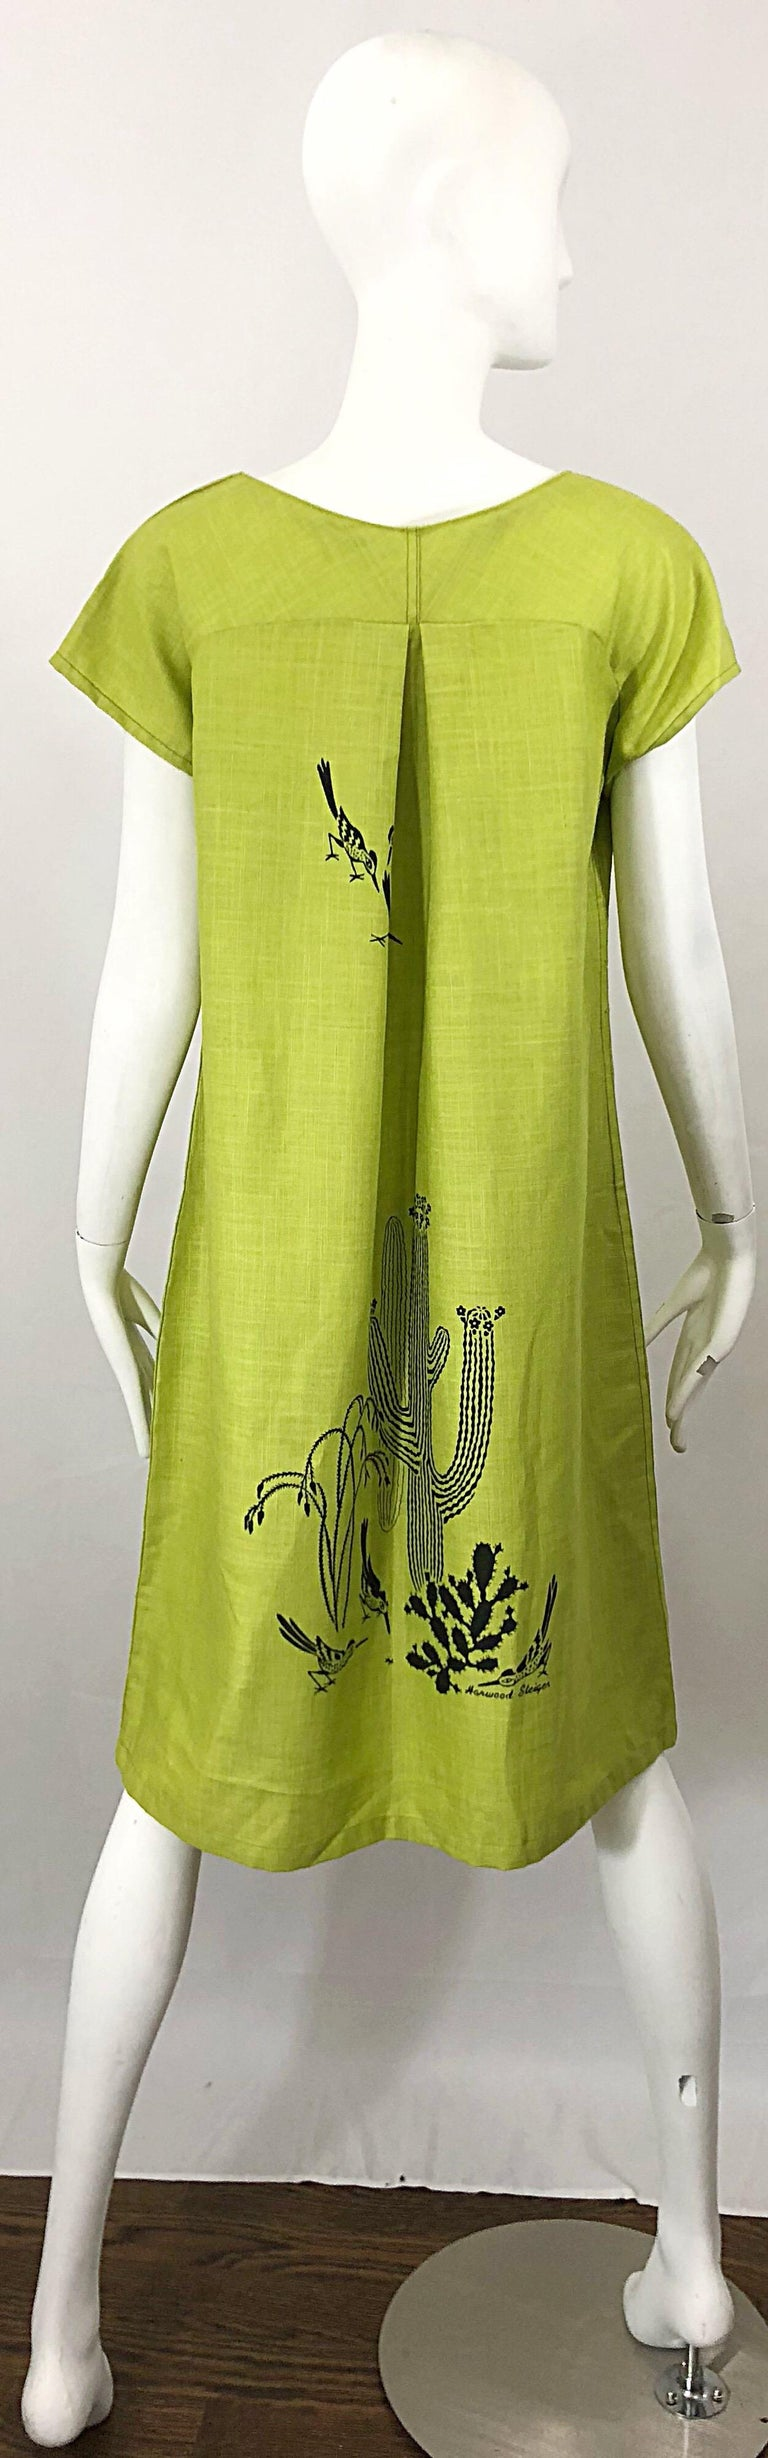 Women's Rare 1970s Harwood Steiger Screen Printed Ant Eater Novelty Linen Tunic Dress For Sale